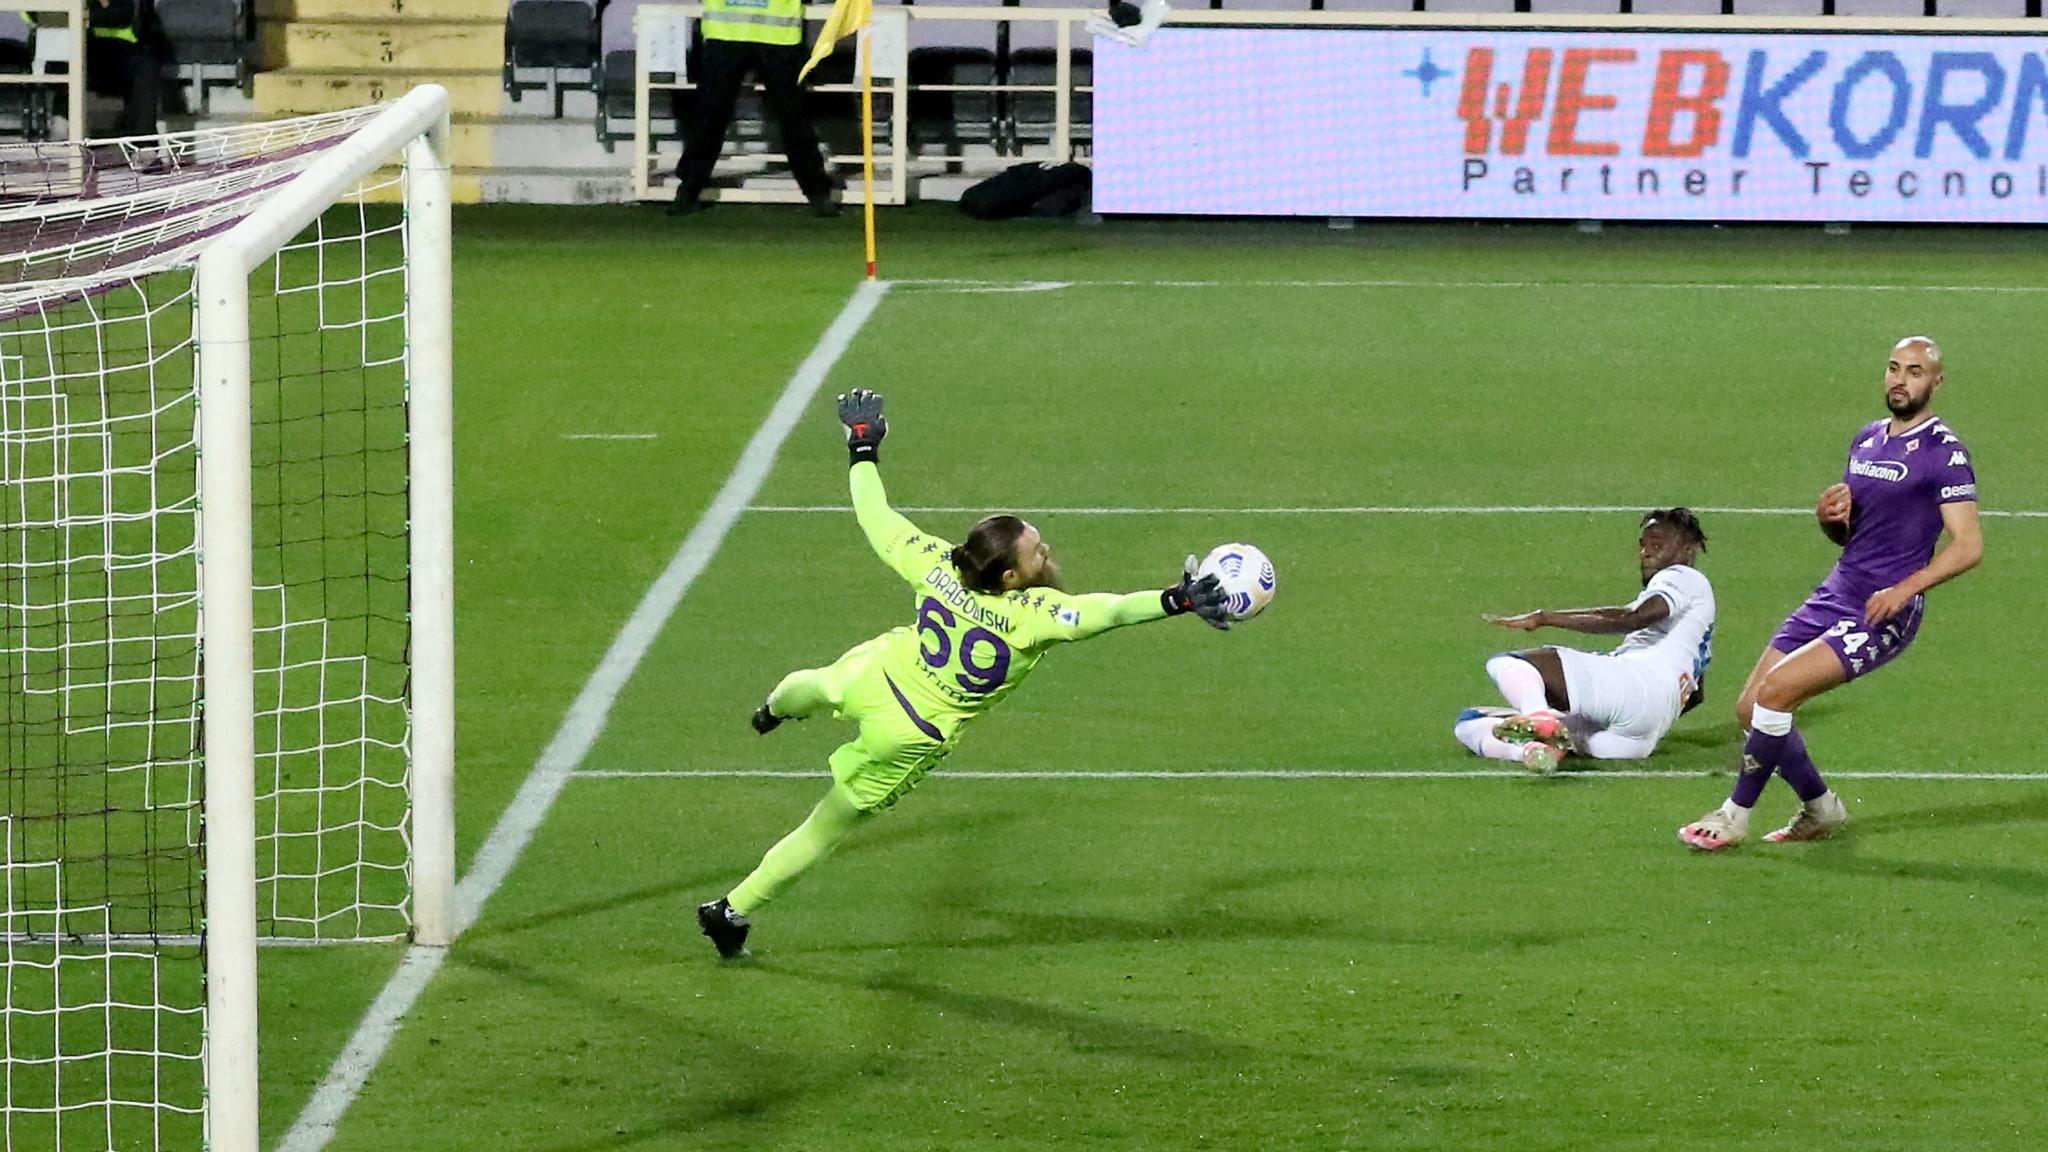 Serie A - Fiorentina 2 - Atalanta 3 - Video - RaiPlay